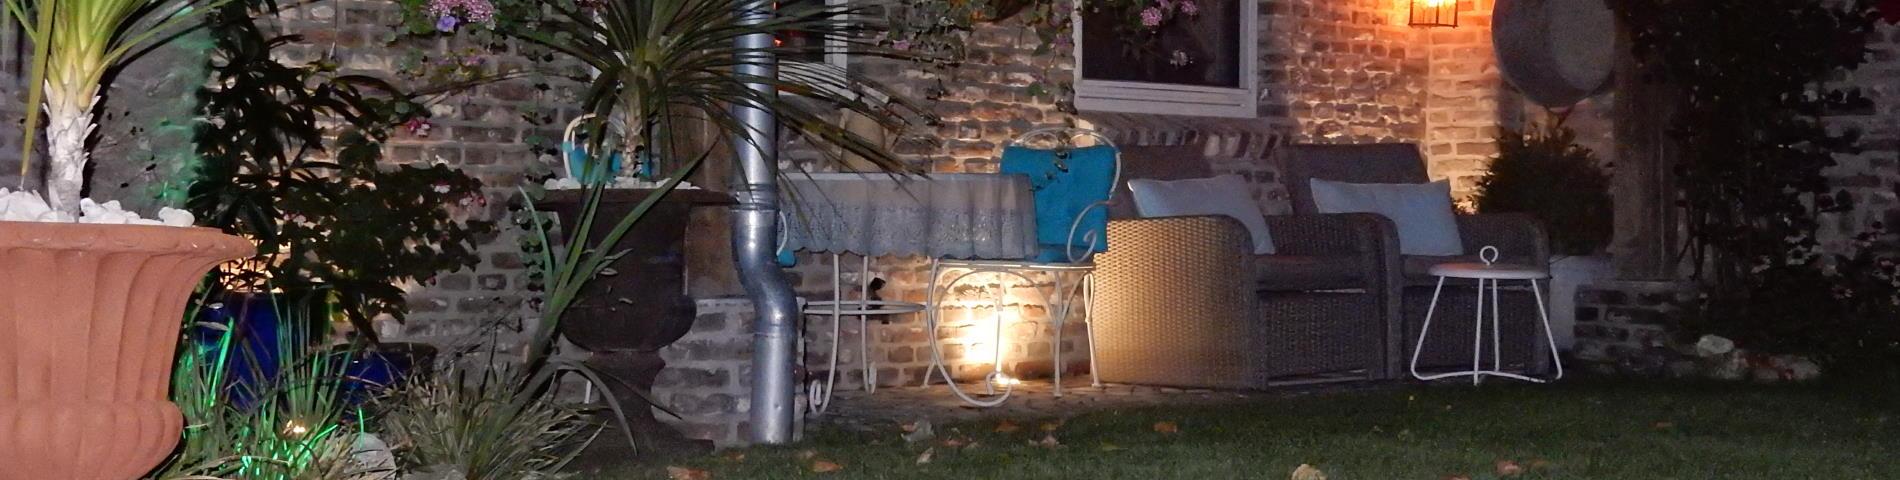 Ons B&B terras bij nacht.